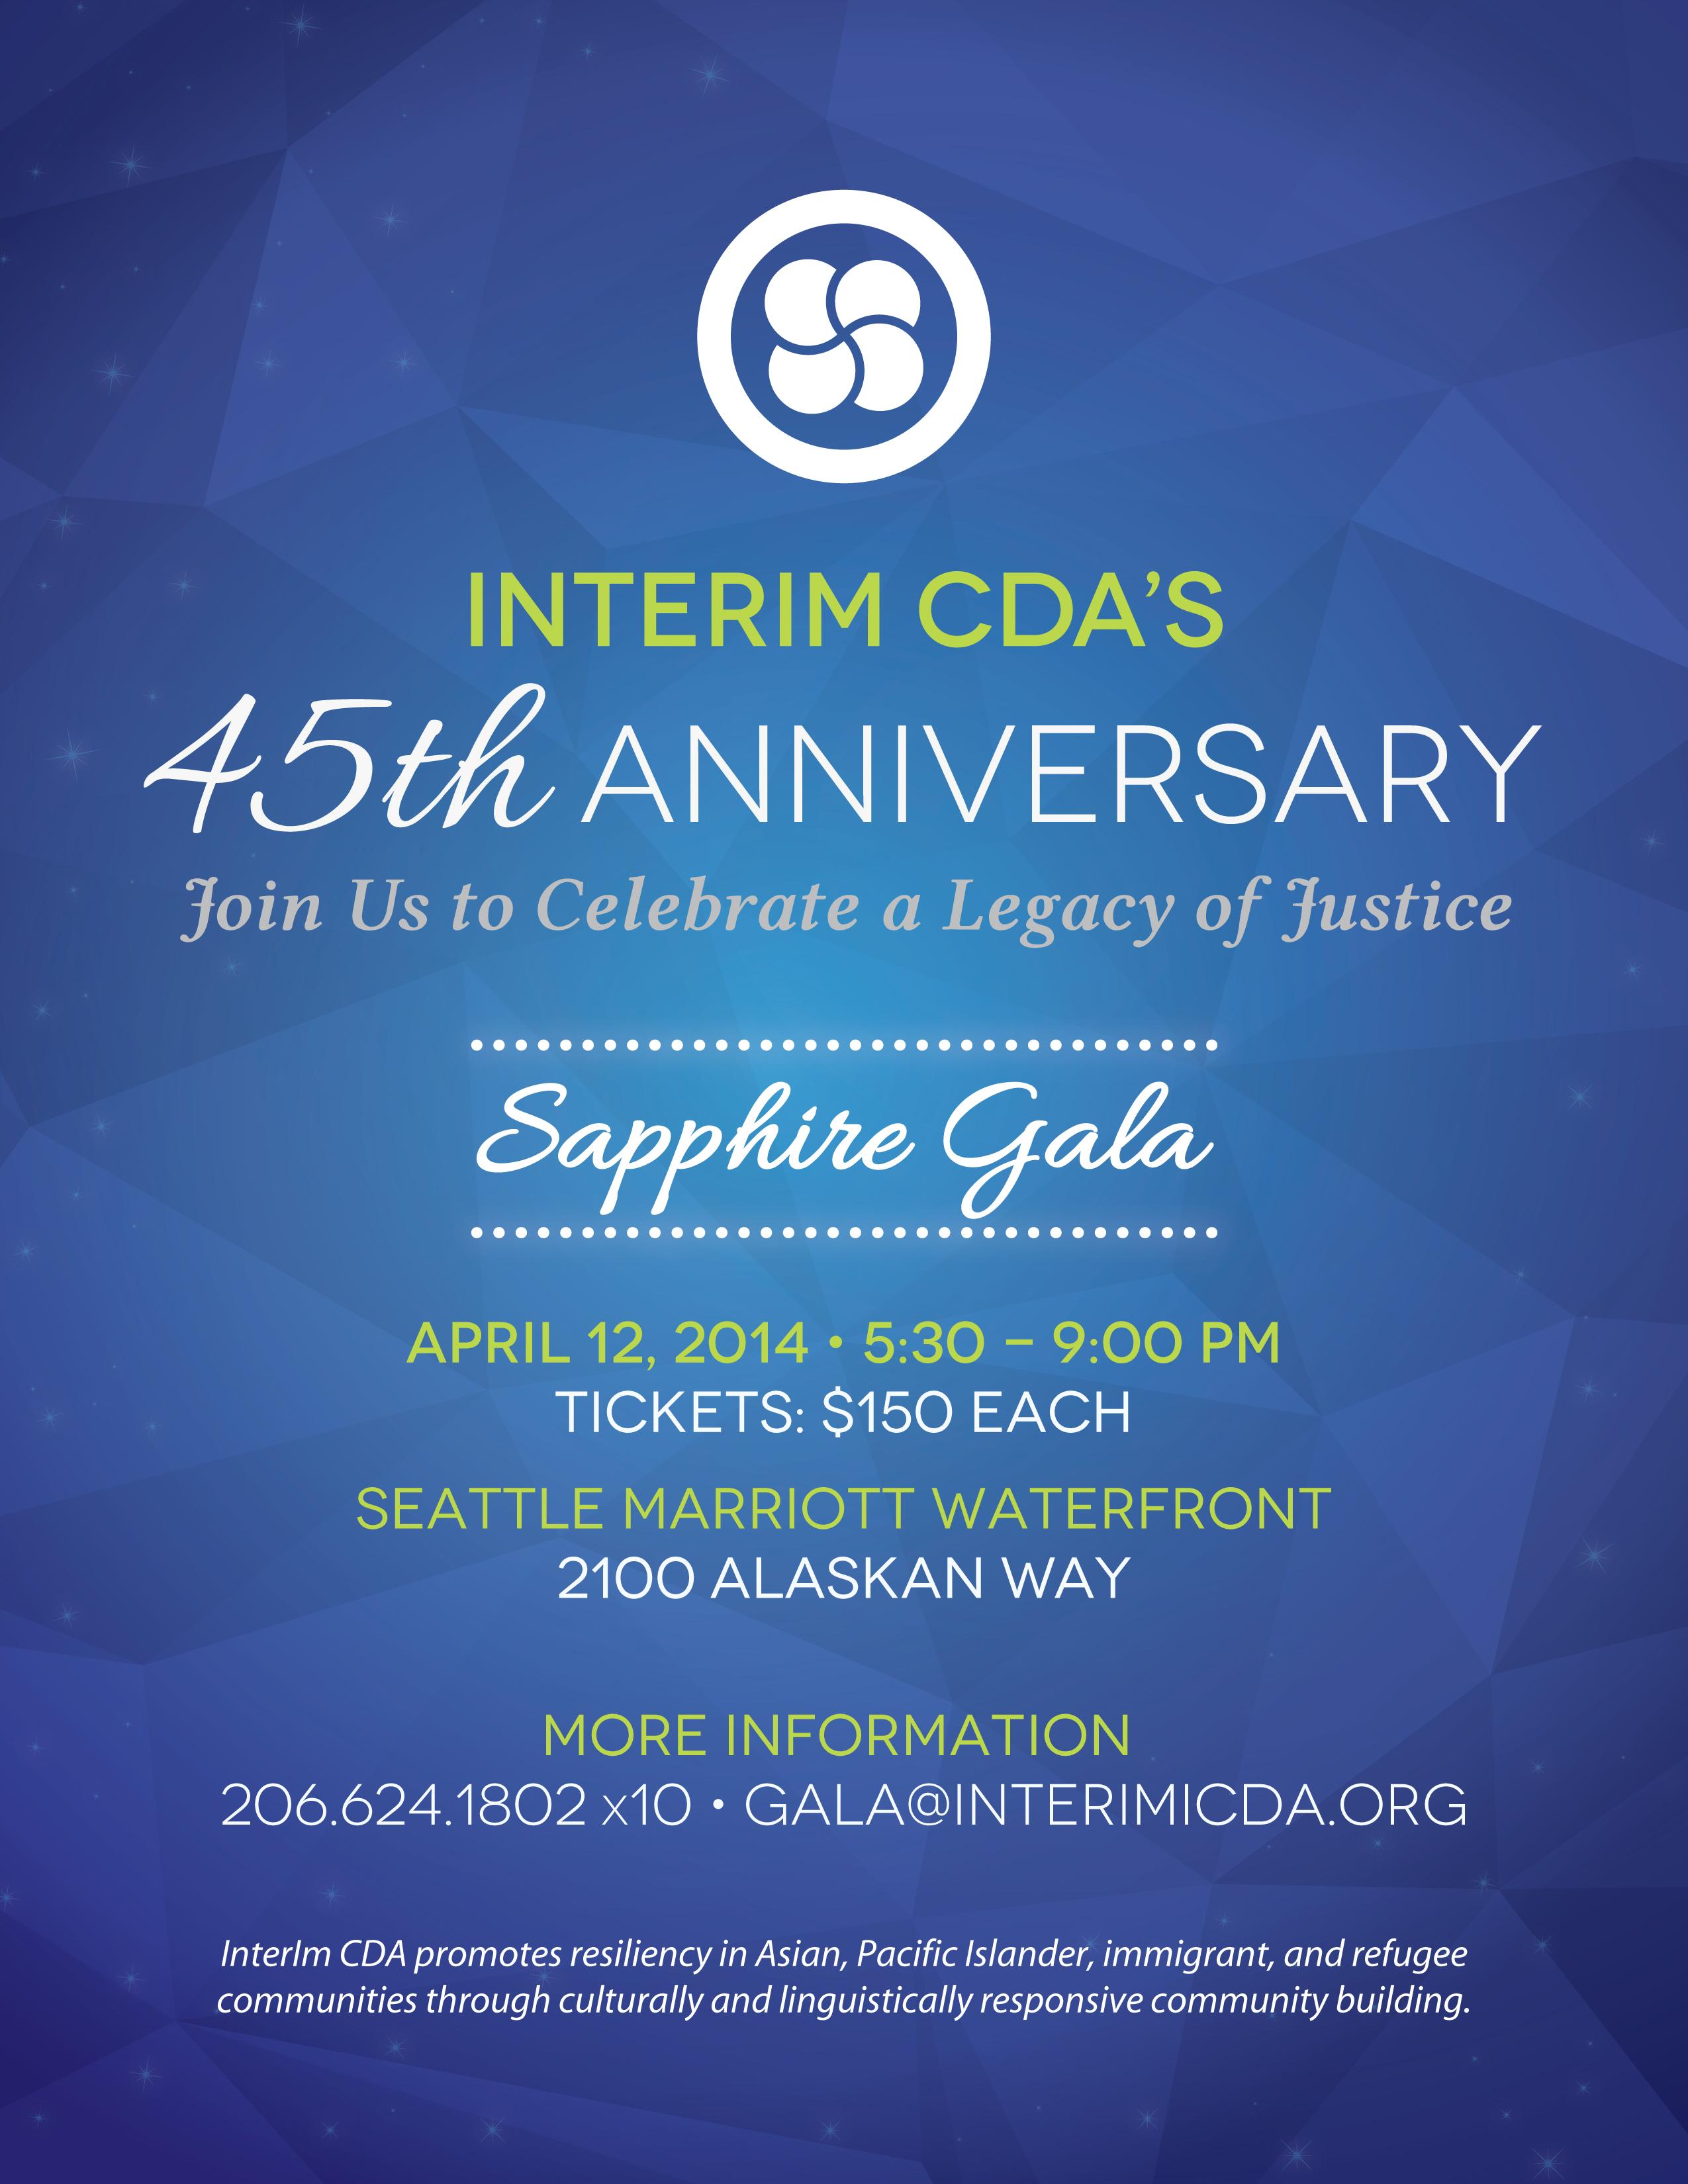 InterIm CDA 45th Anniversary- Sapphire Gala